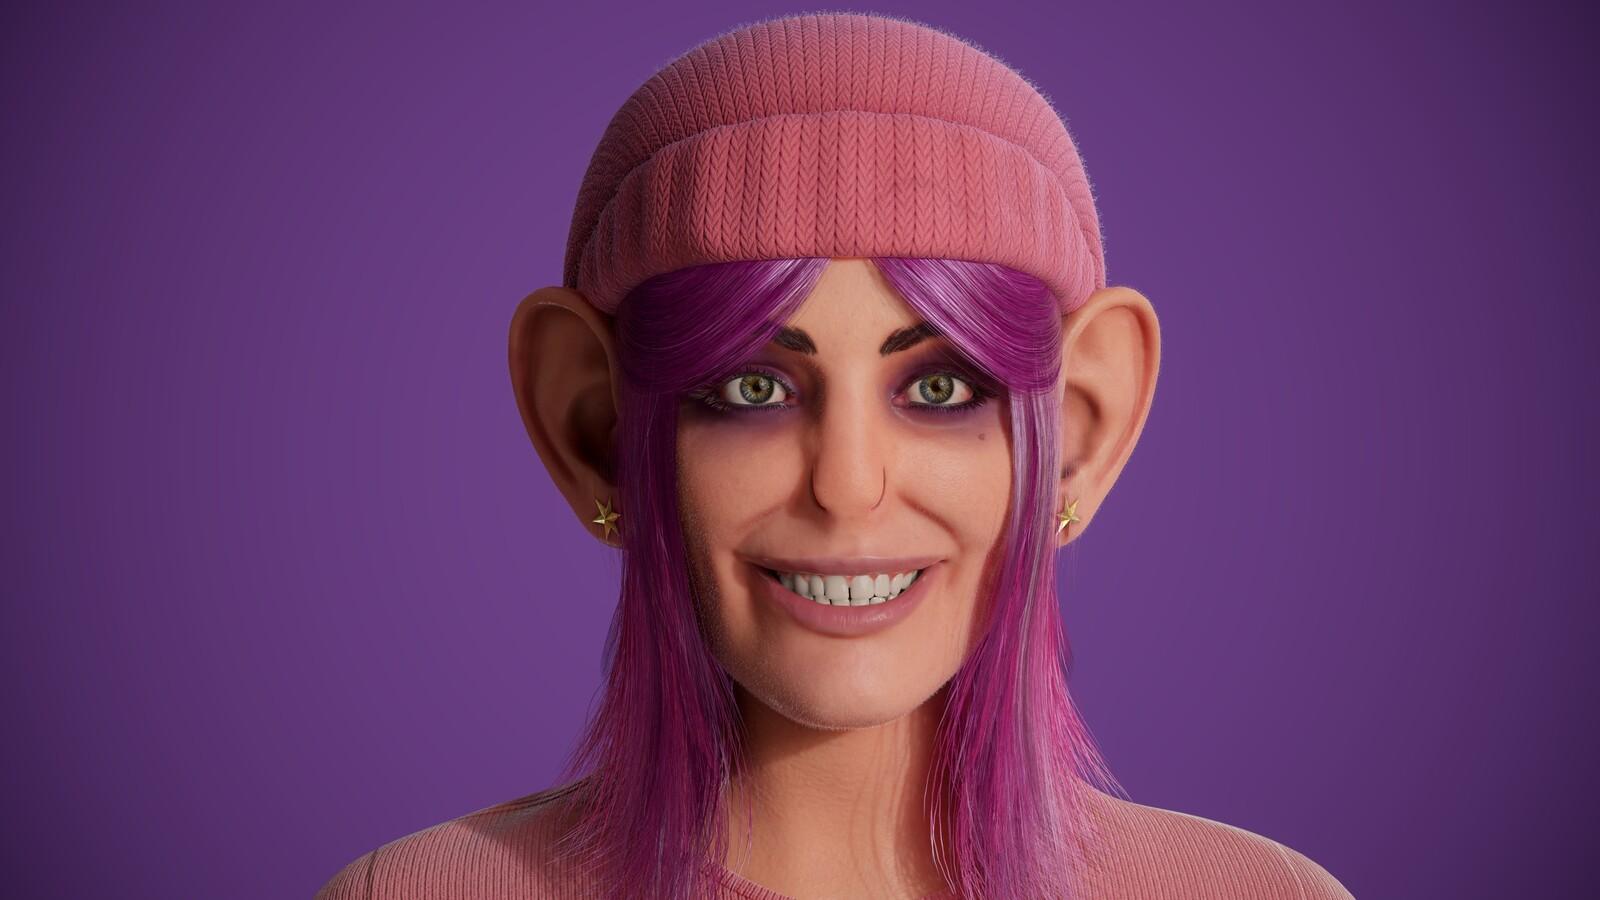 Izabel from Saga